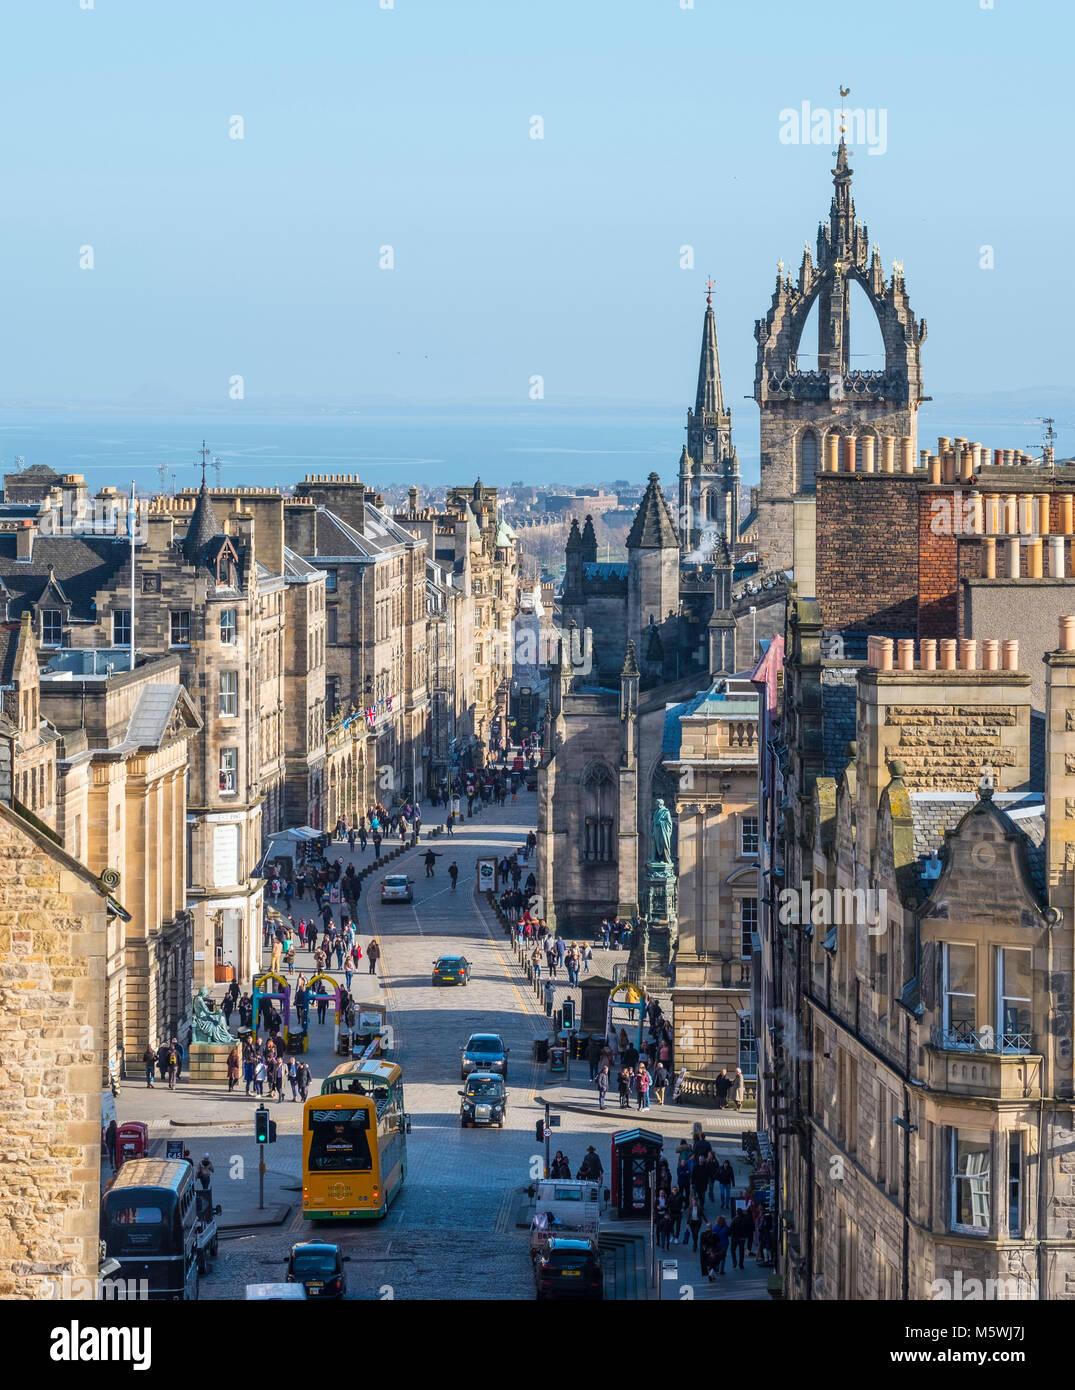 View down historic Royal Mile in Edinburgh Old Town, Scotland, United Kingdom - Stock Image